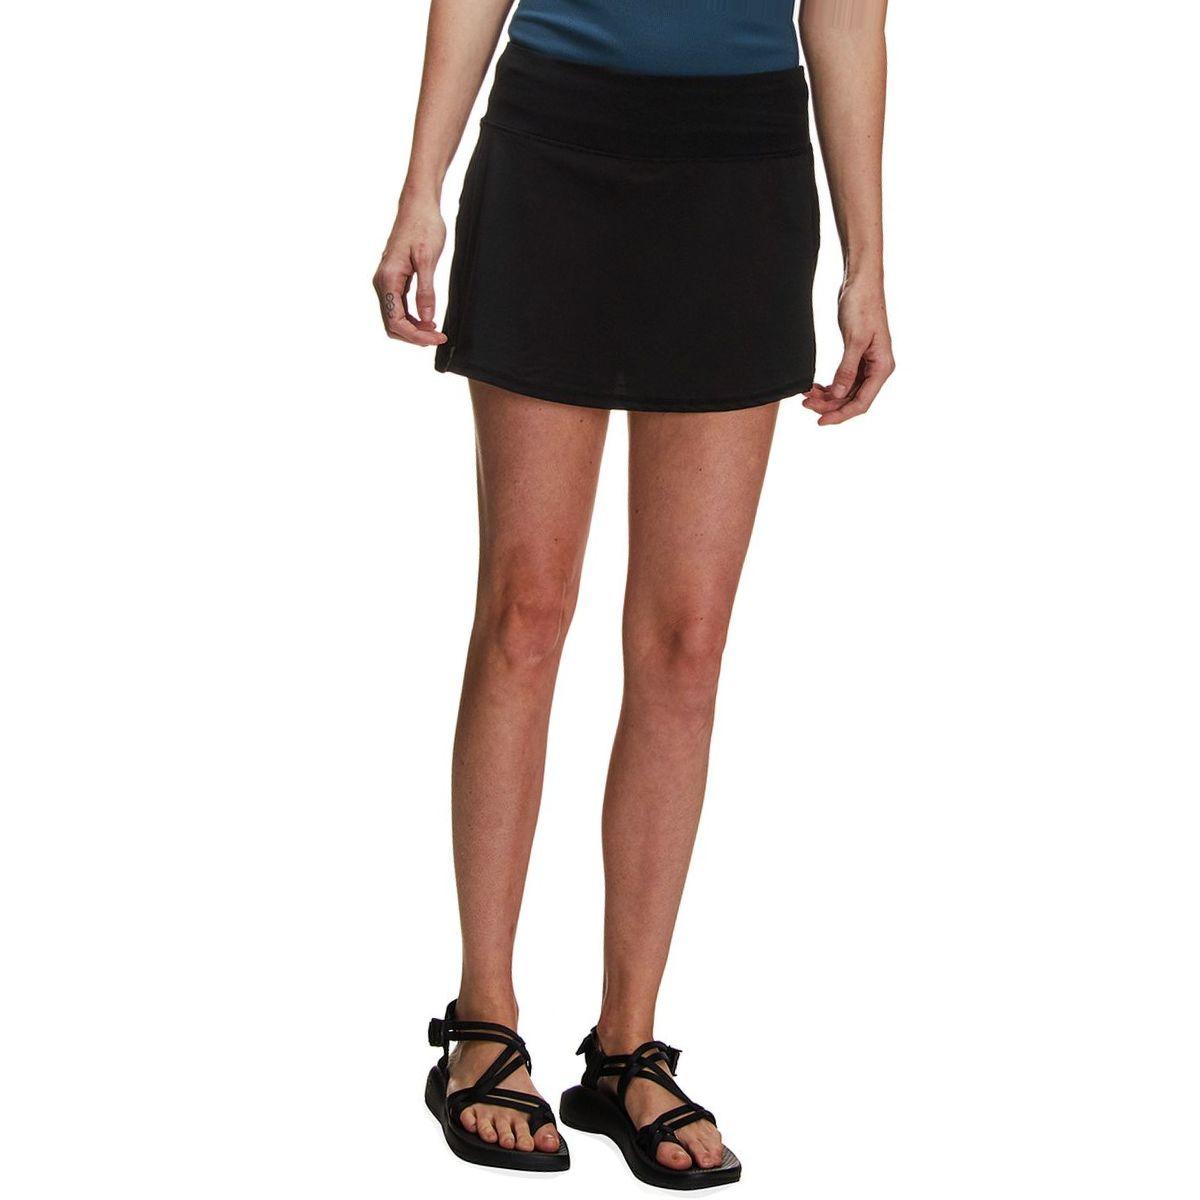 Vuori Revolve Performance Skirt - Women's